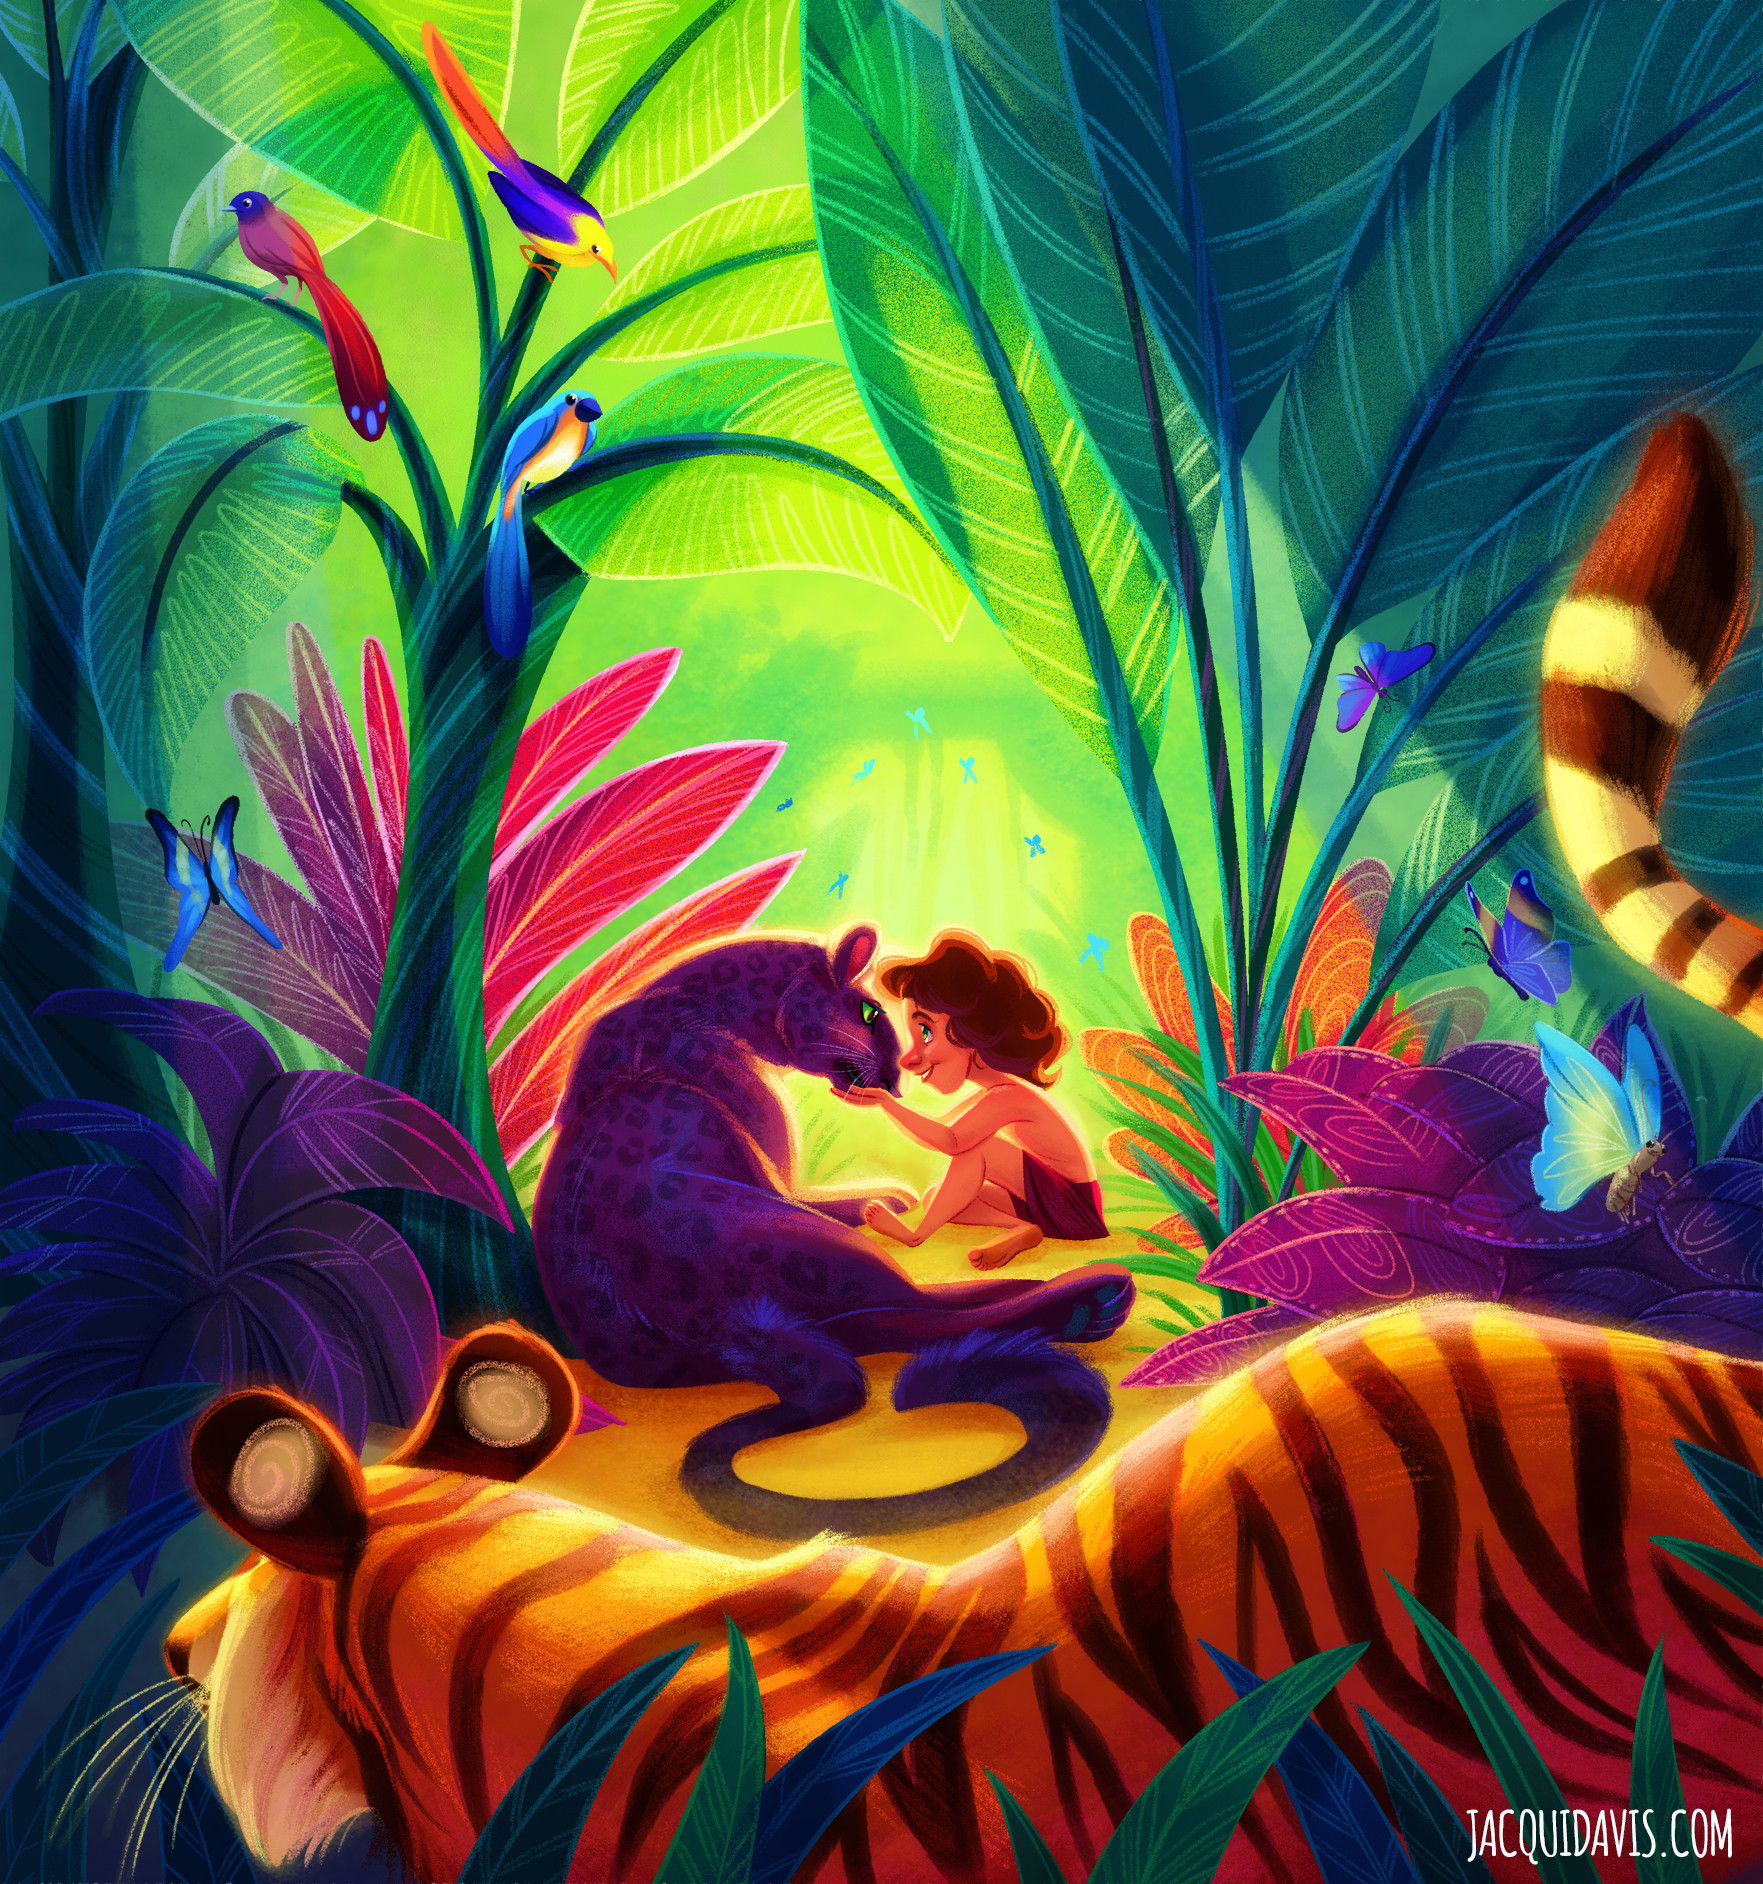 Jacqui davis jungle book copy